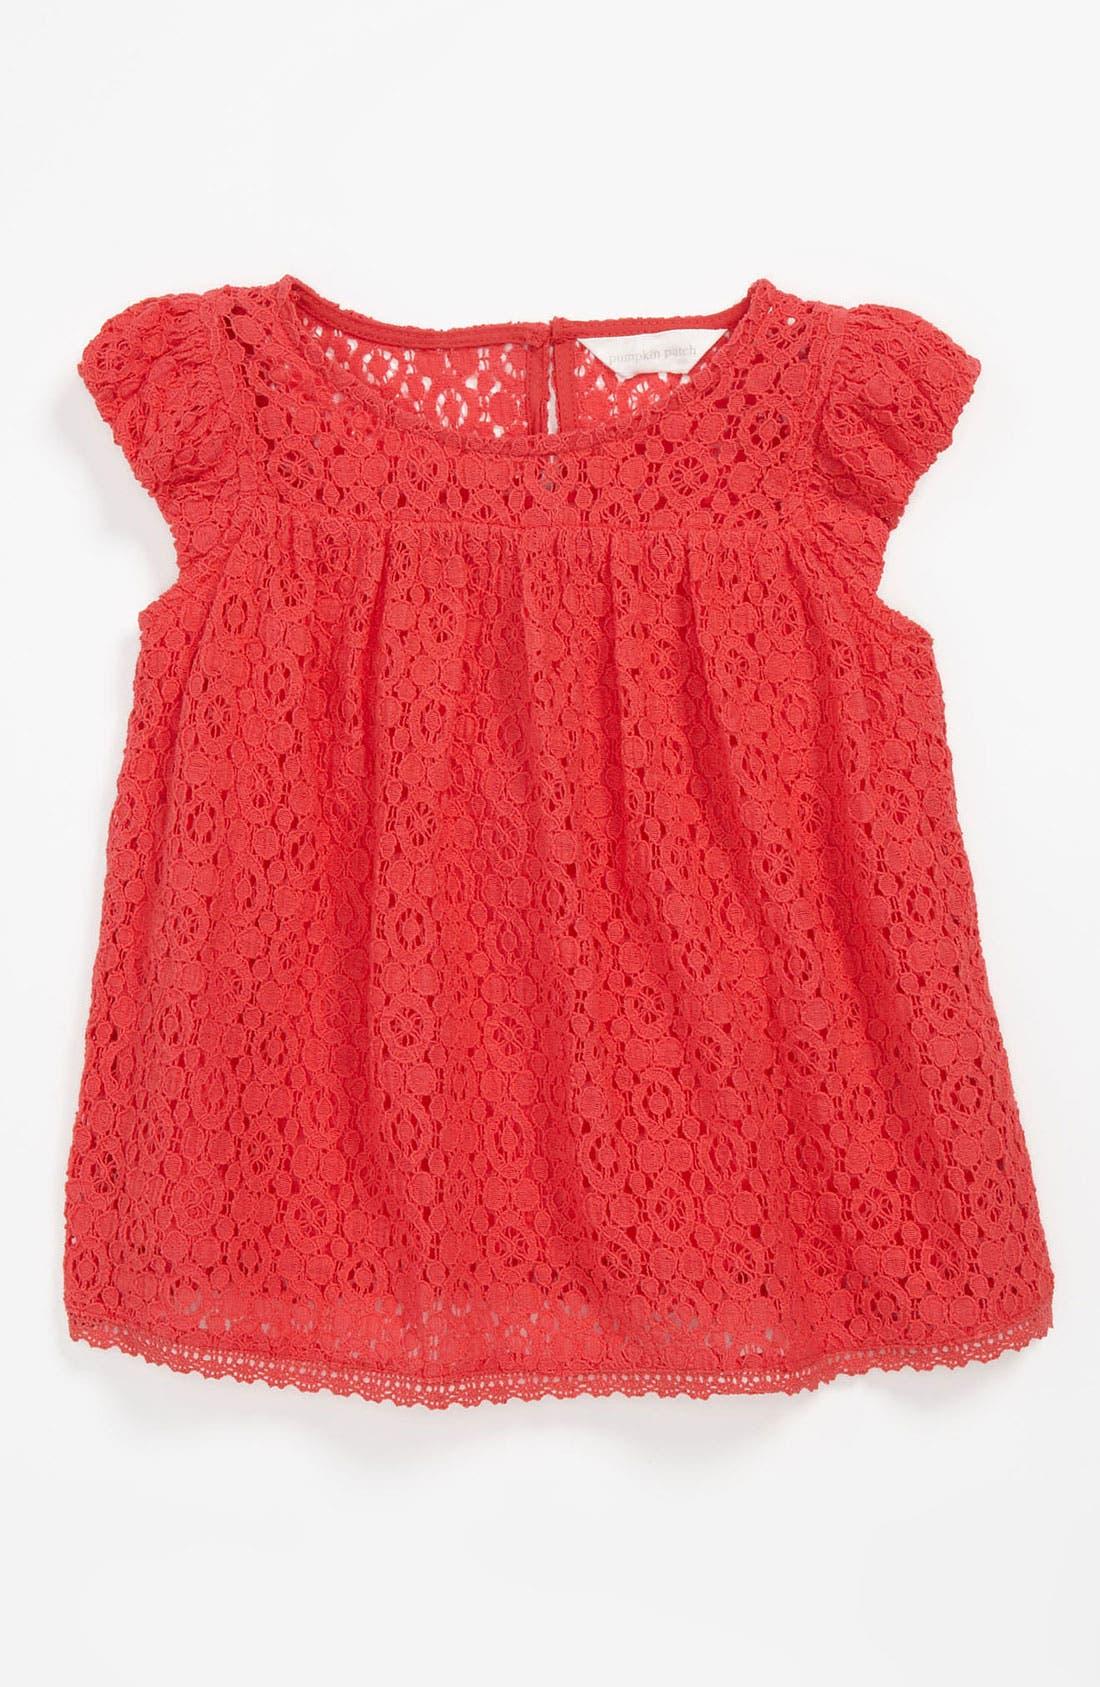 Main Image - Pumpkin Patch Lace Top (Toddler)